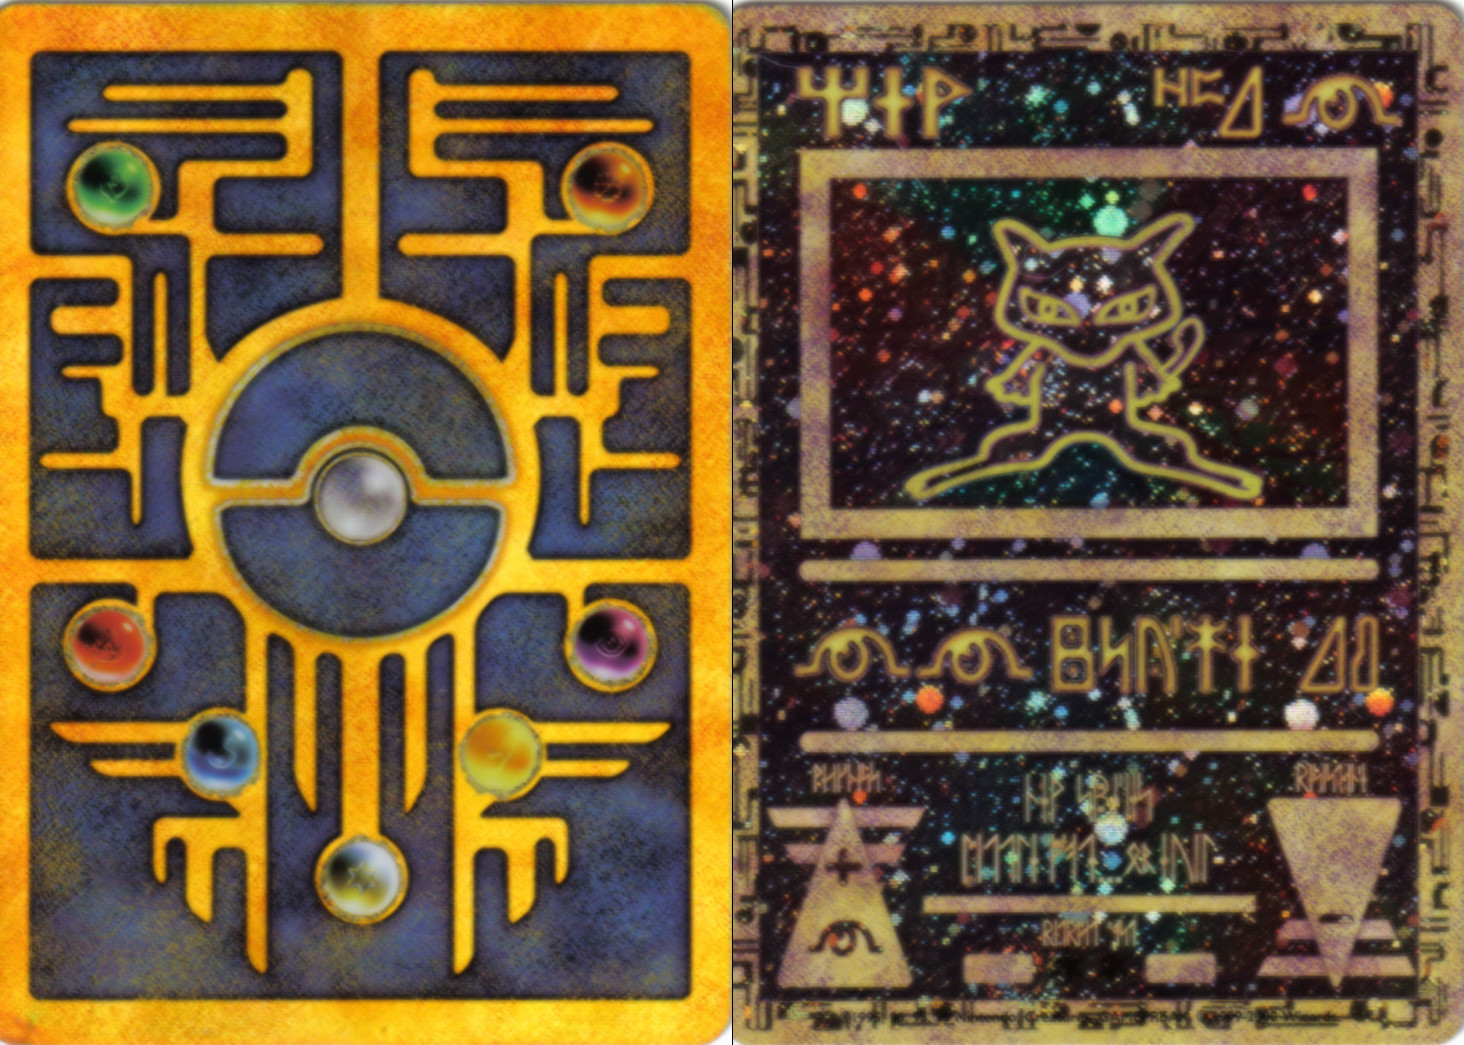 ancient mew wallpaper - photo #3